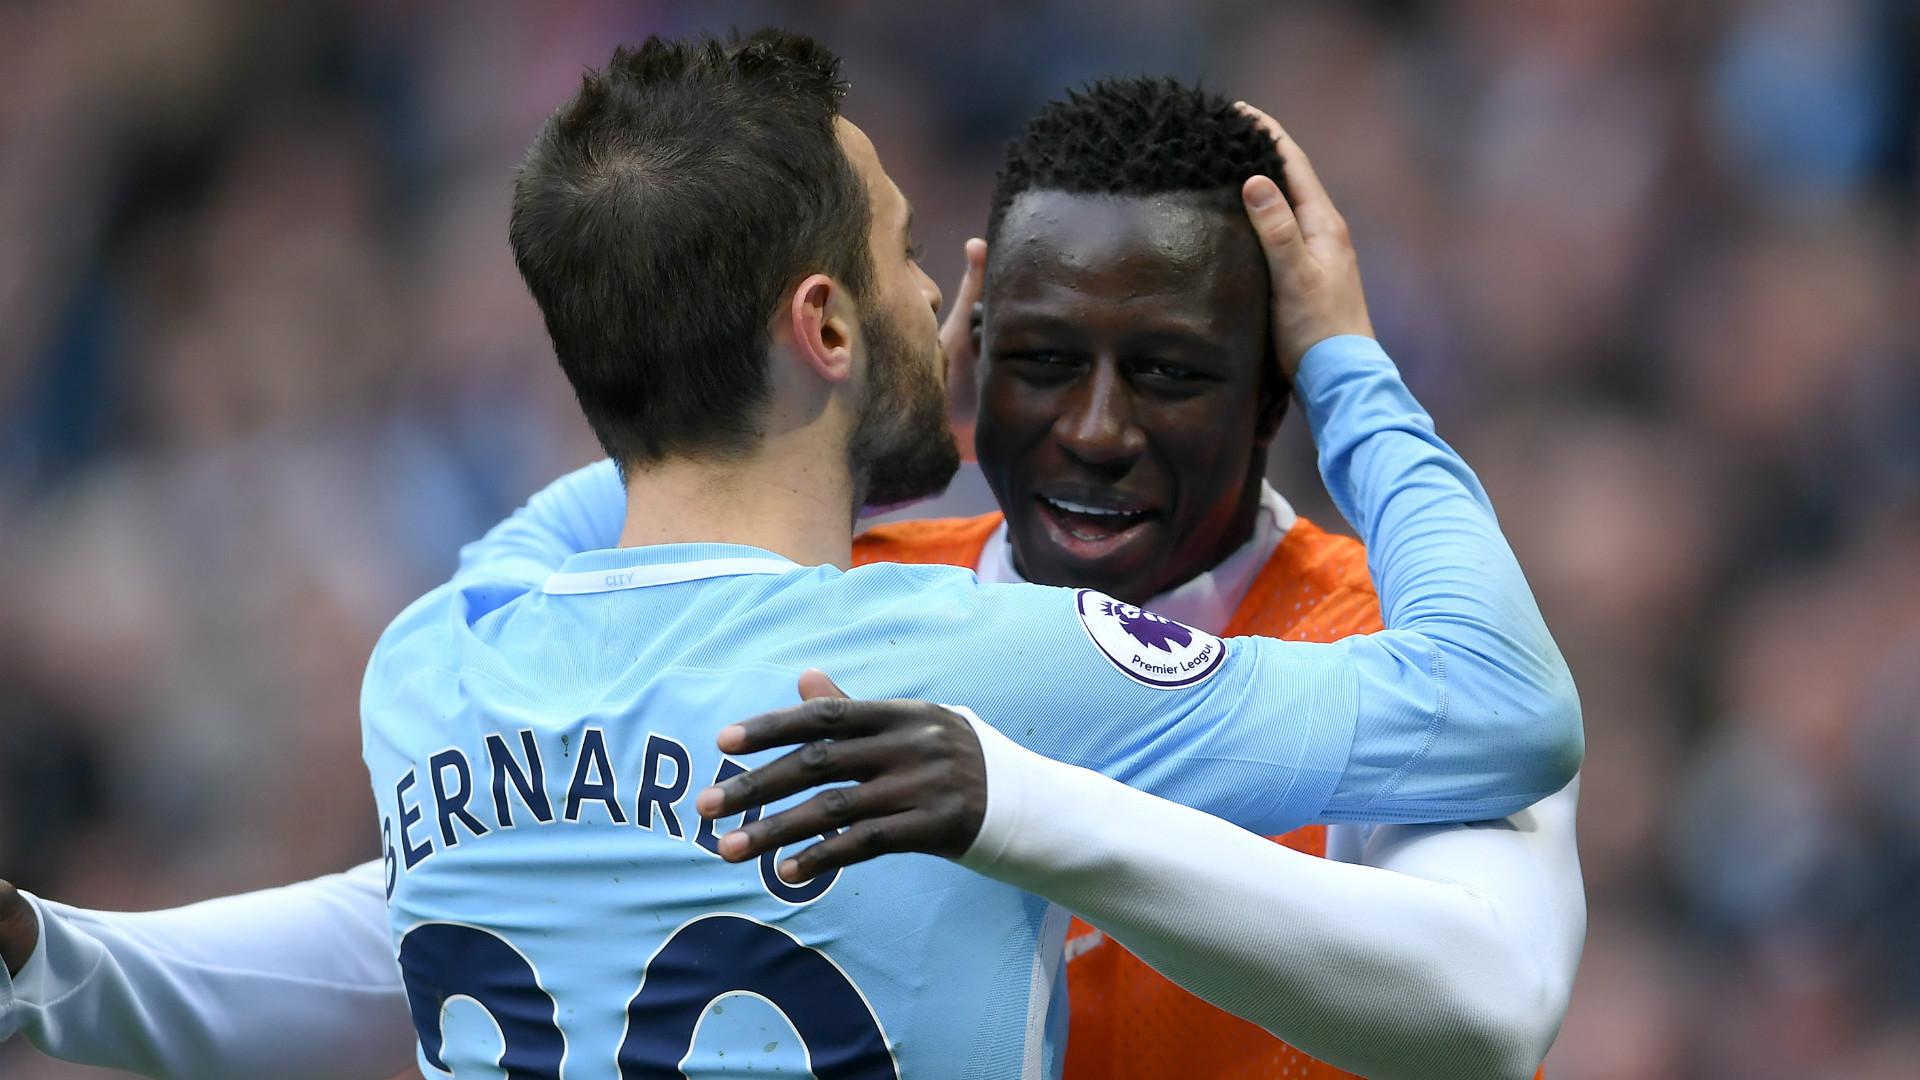 Manchester City boss Guardiola backs Bernardo after controversial tweet involving teammate Mendy